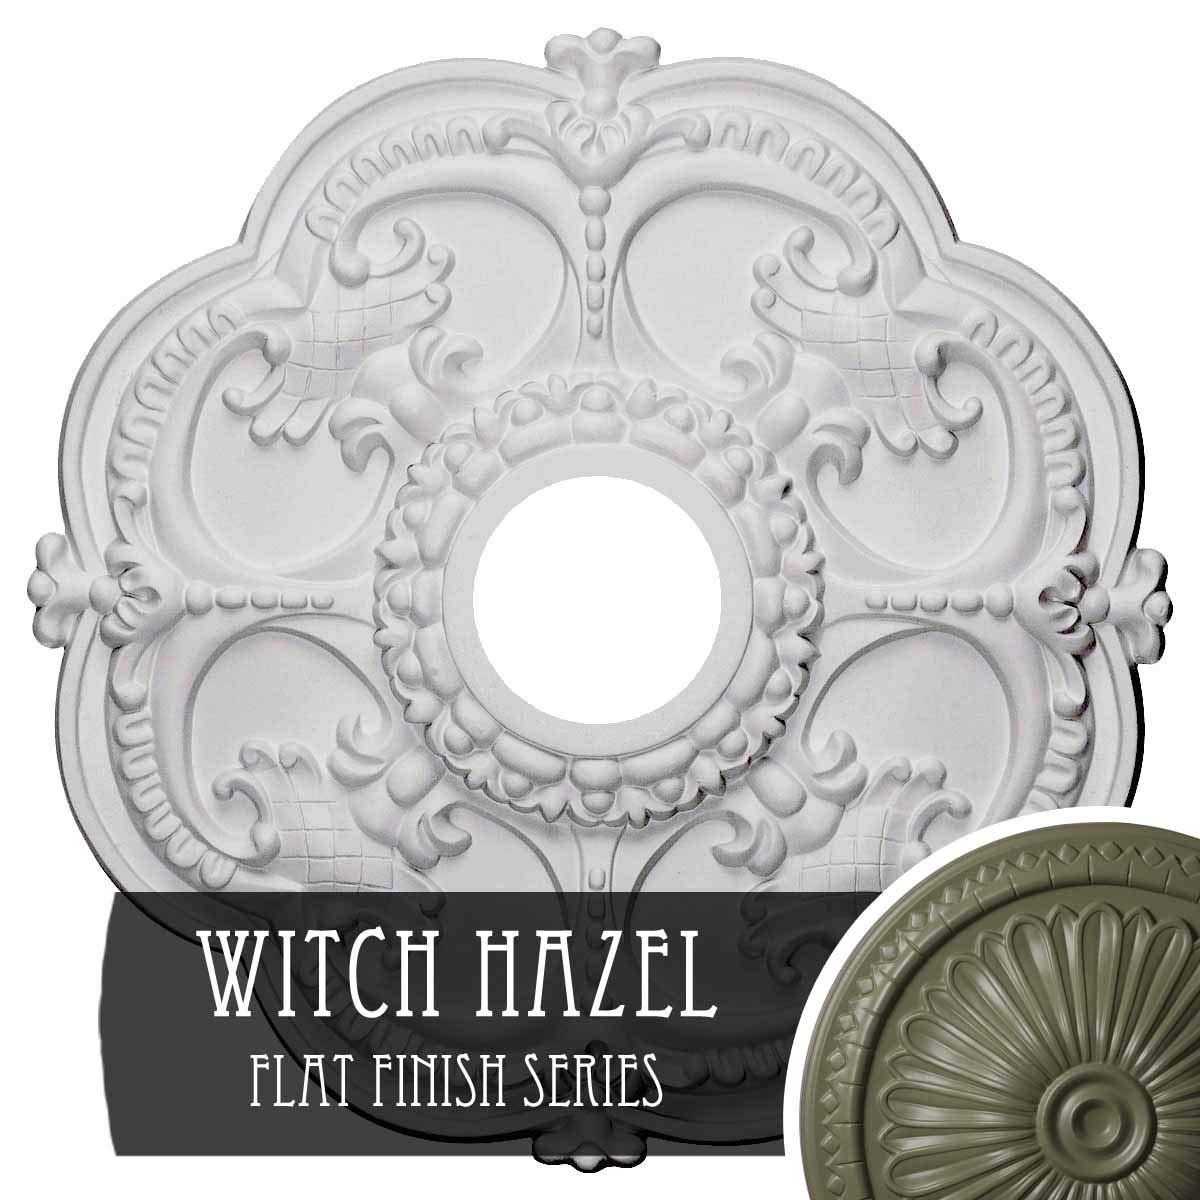 Witch Hazel Ekena Millwork CM17ROUWF redherham Ceiling Medallion, 18 OD x 3 1 2 ID x 1 1 2 P, Ultra Pure White